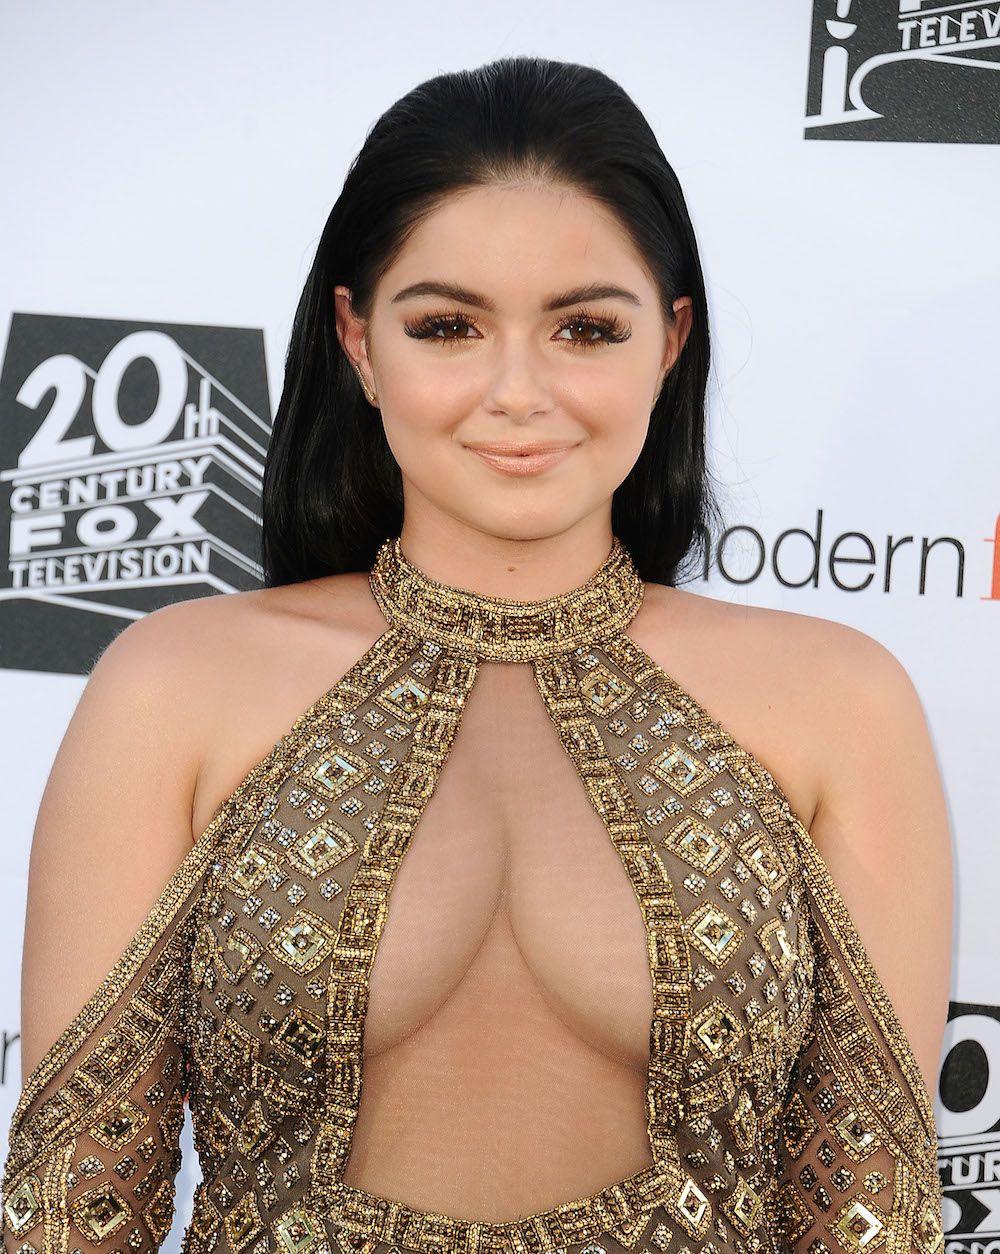 Budding nips girl nudist